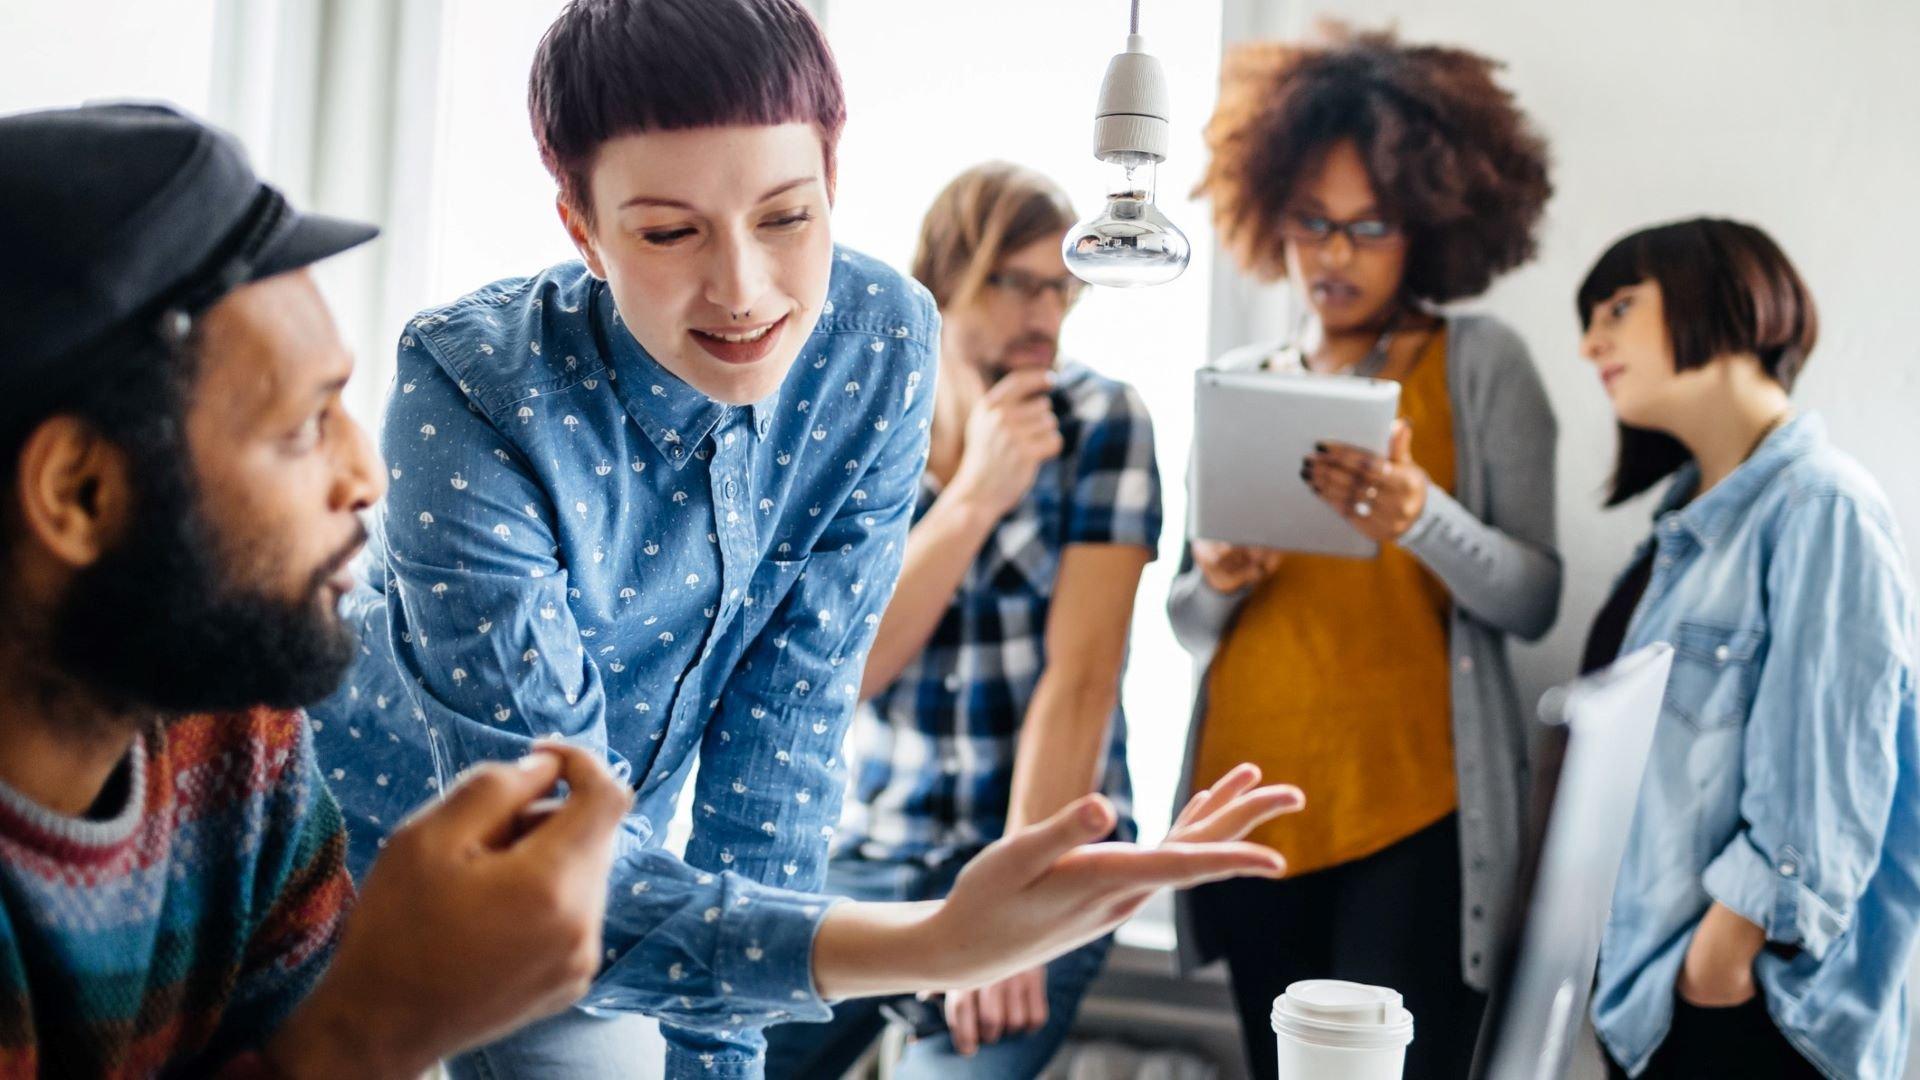 Diverse marketing team brainstorming video concept ideas